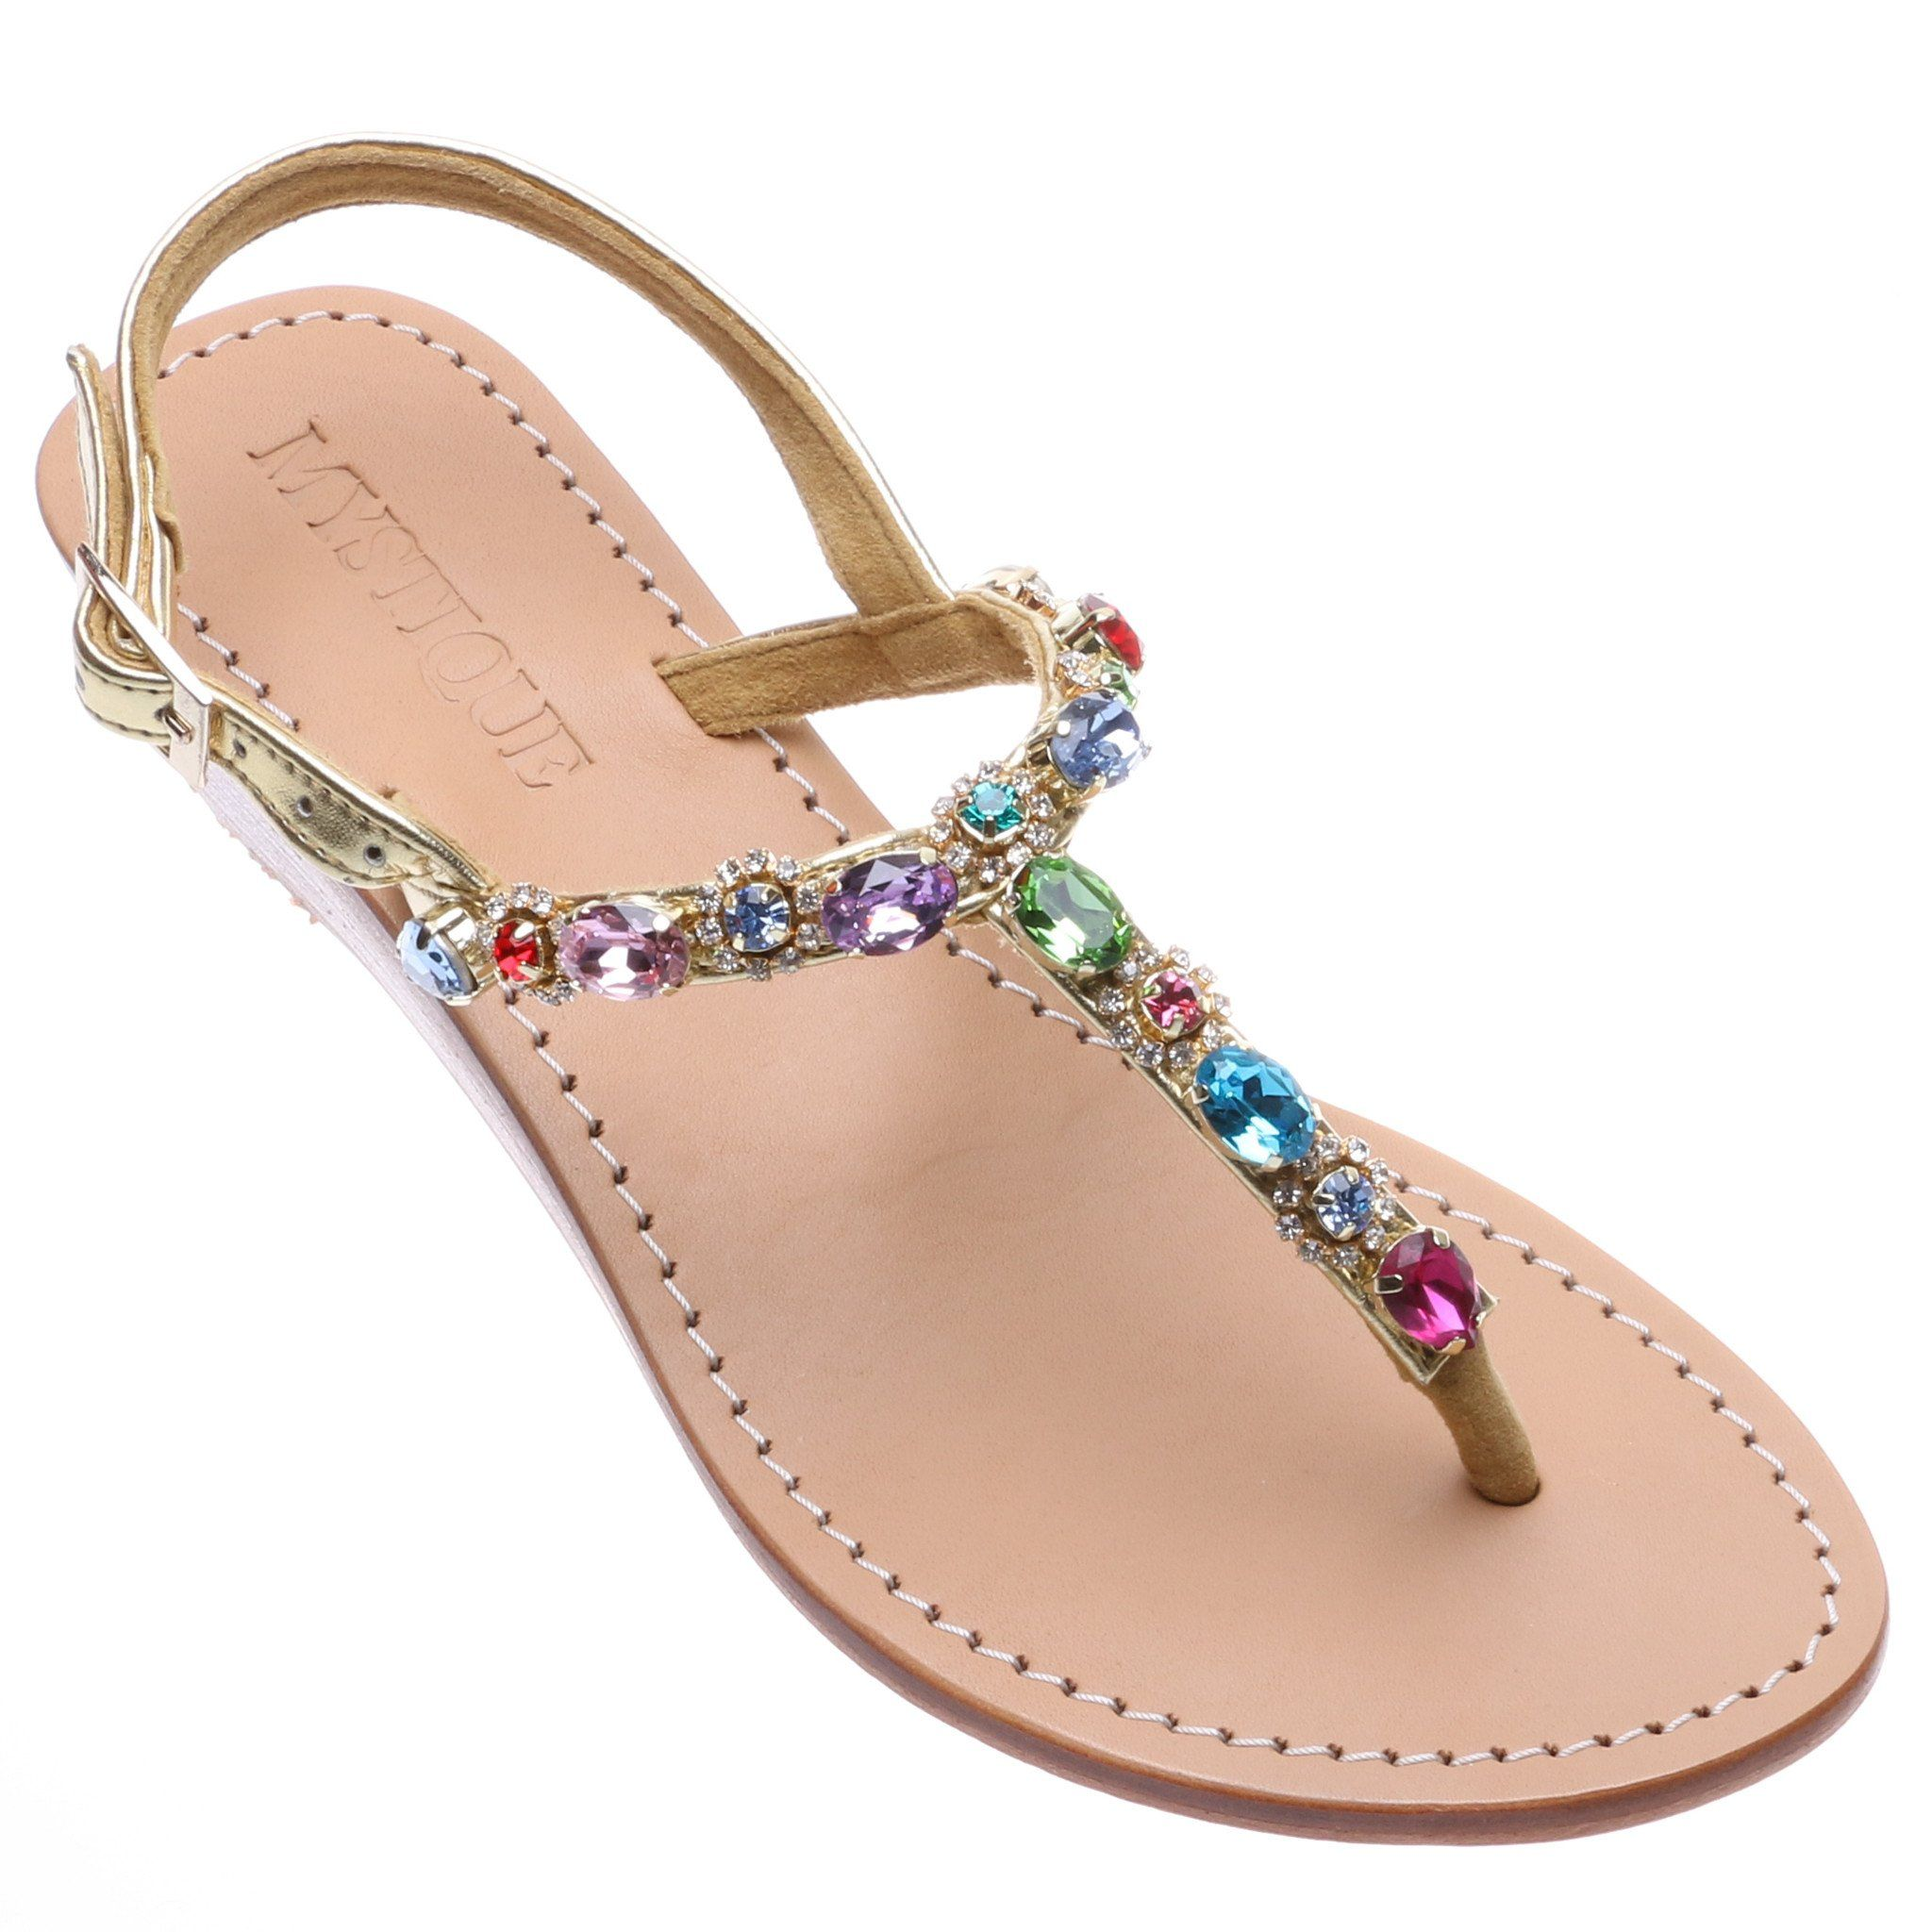 619372347 Mystique Women s Leather Jeweled Sandals - Santa Cruz – Mystique Sandals